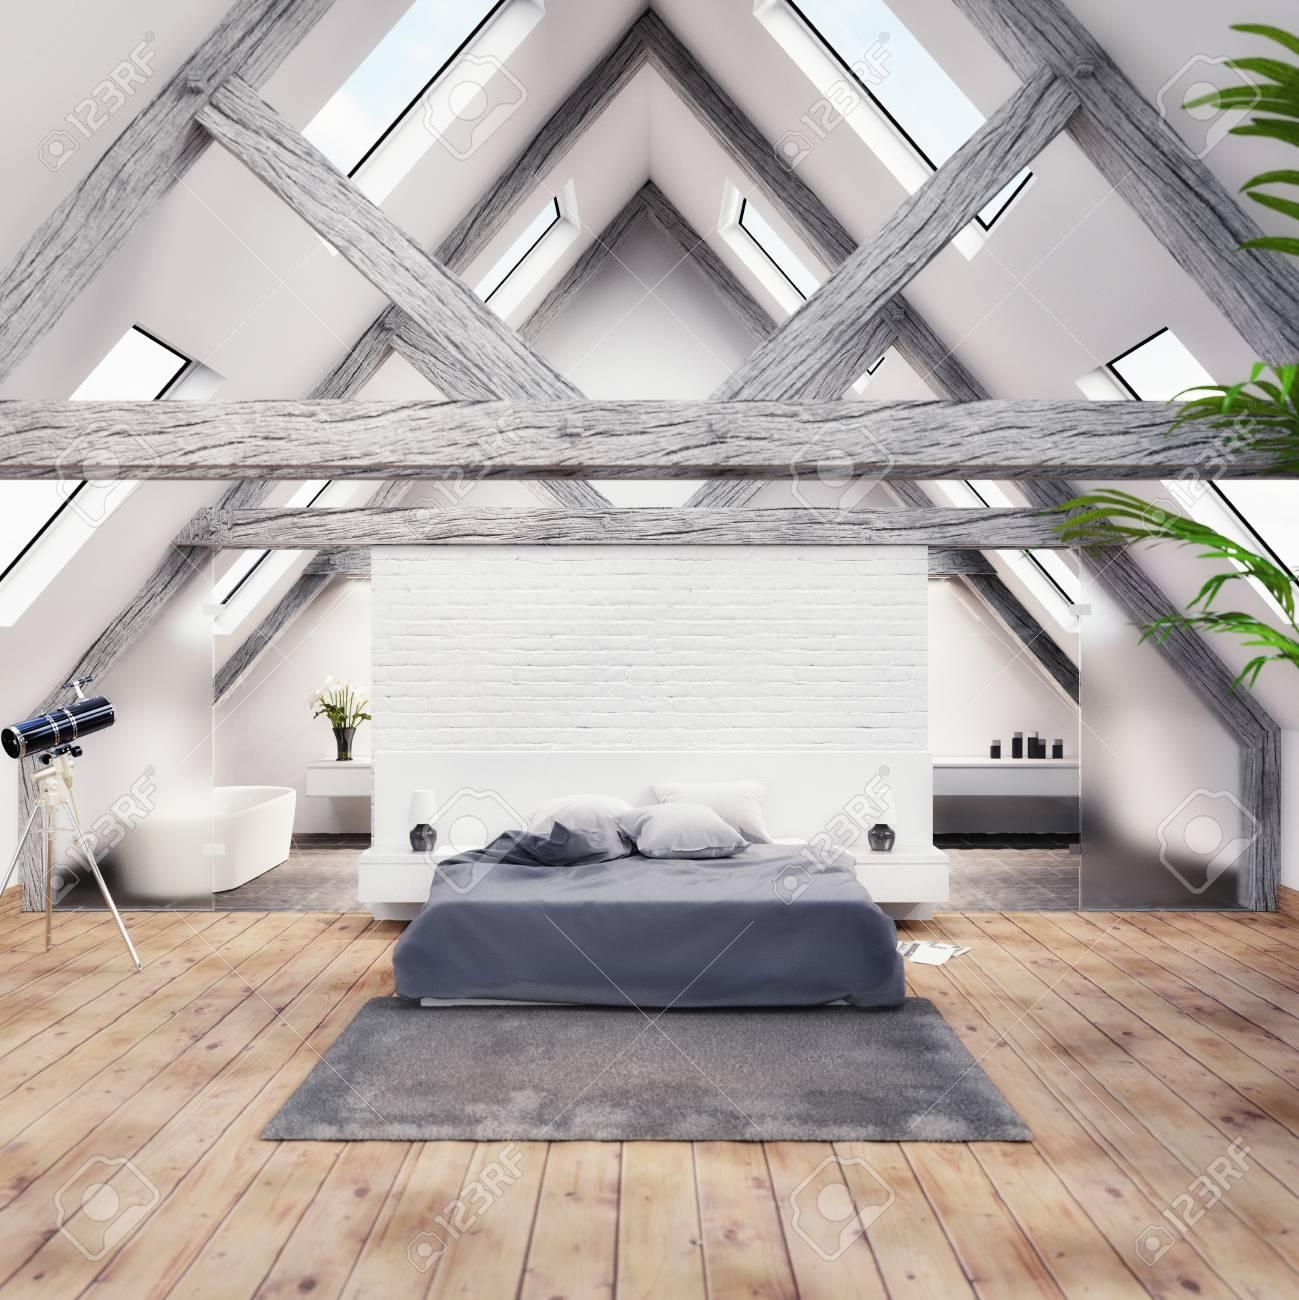 3D render of a modern bedroom with bathroom - 113193479